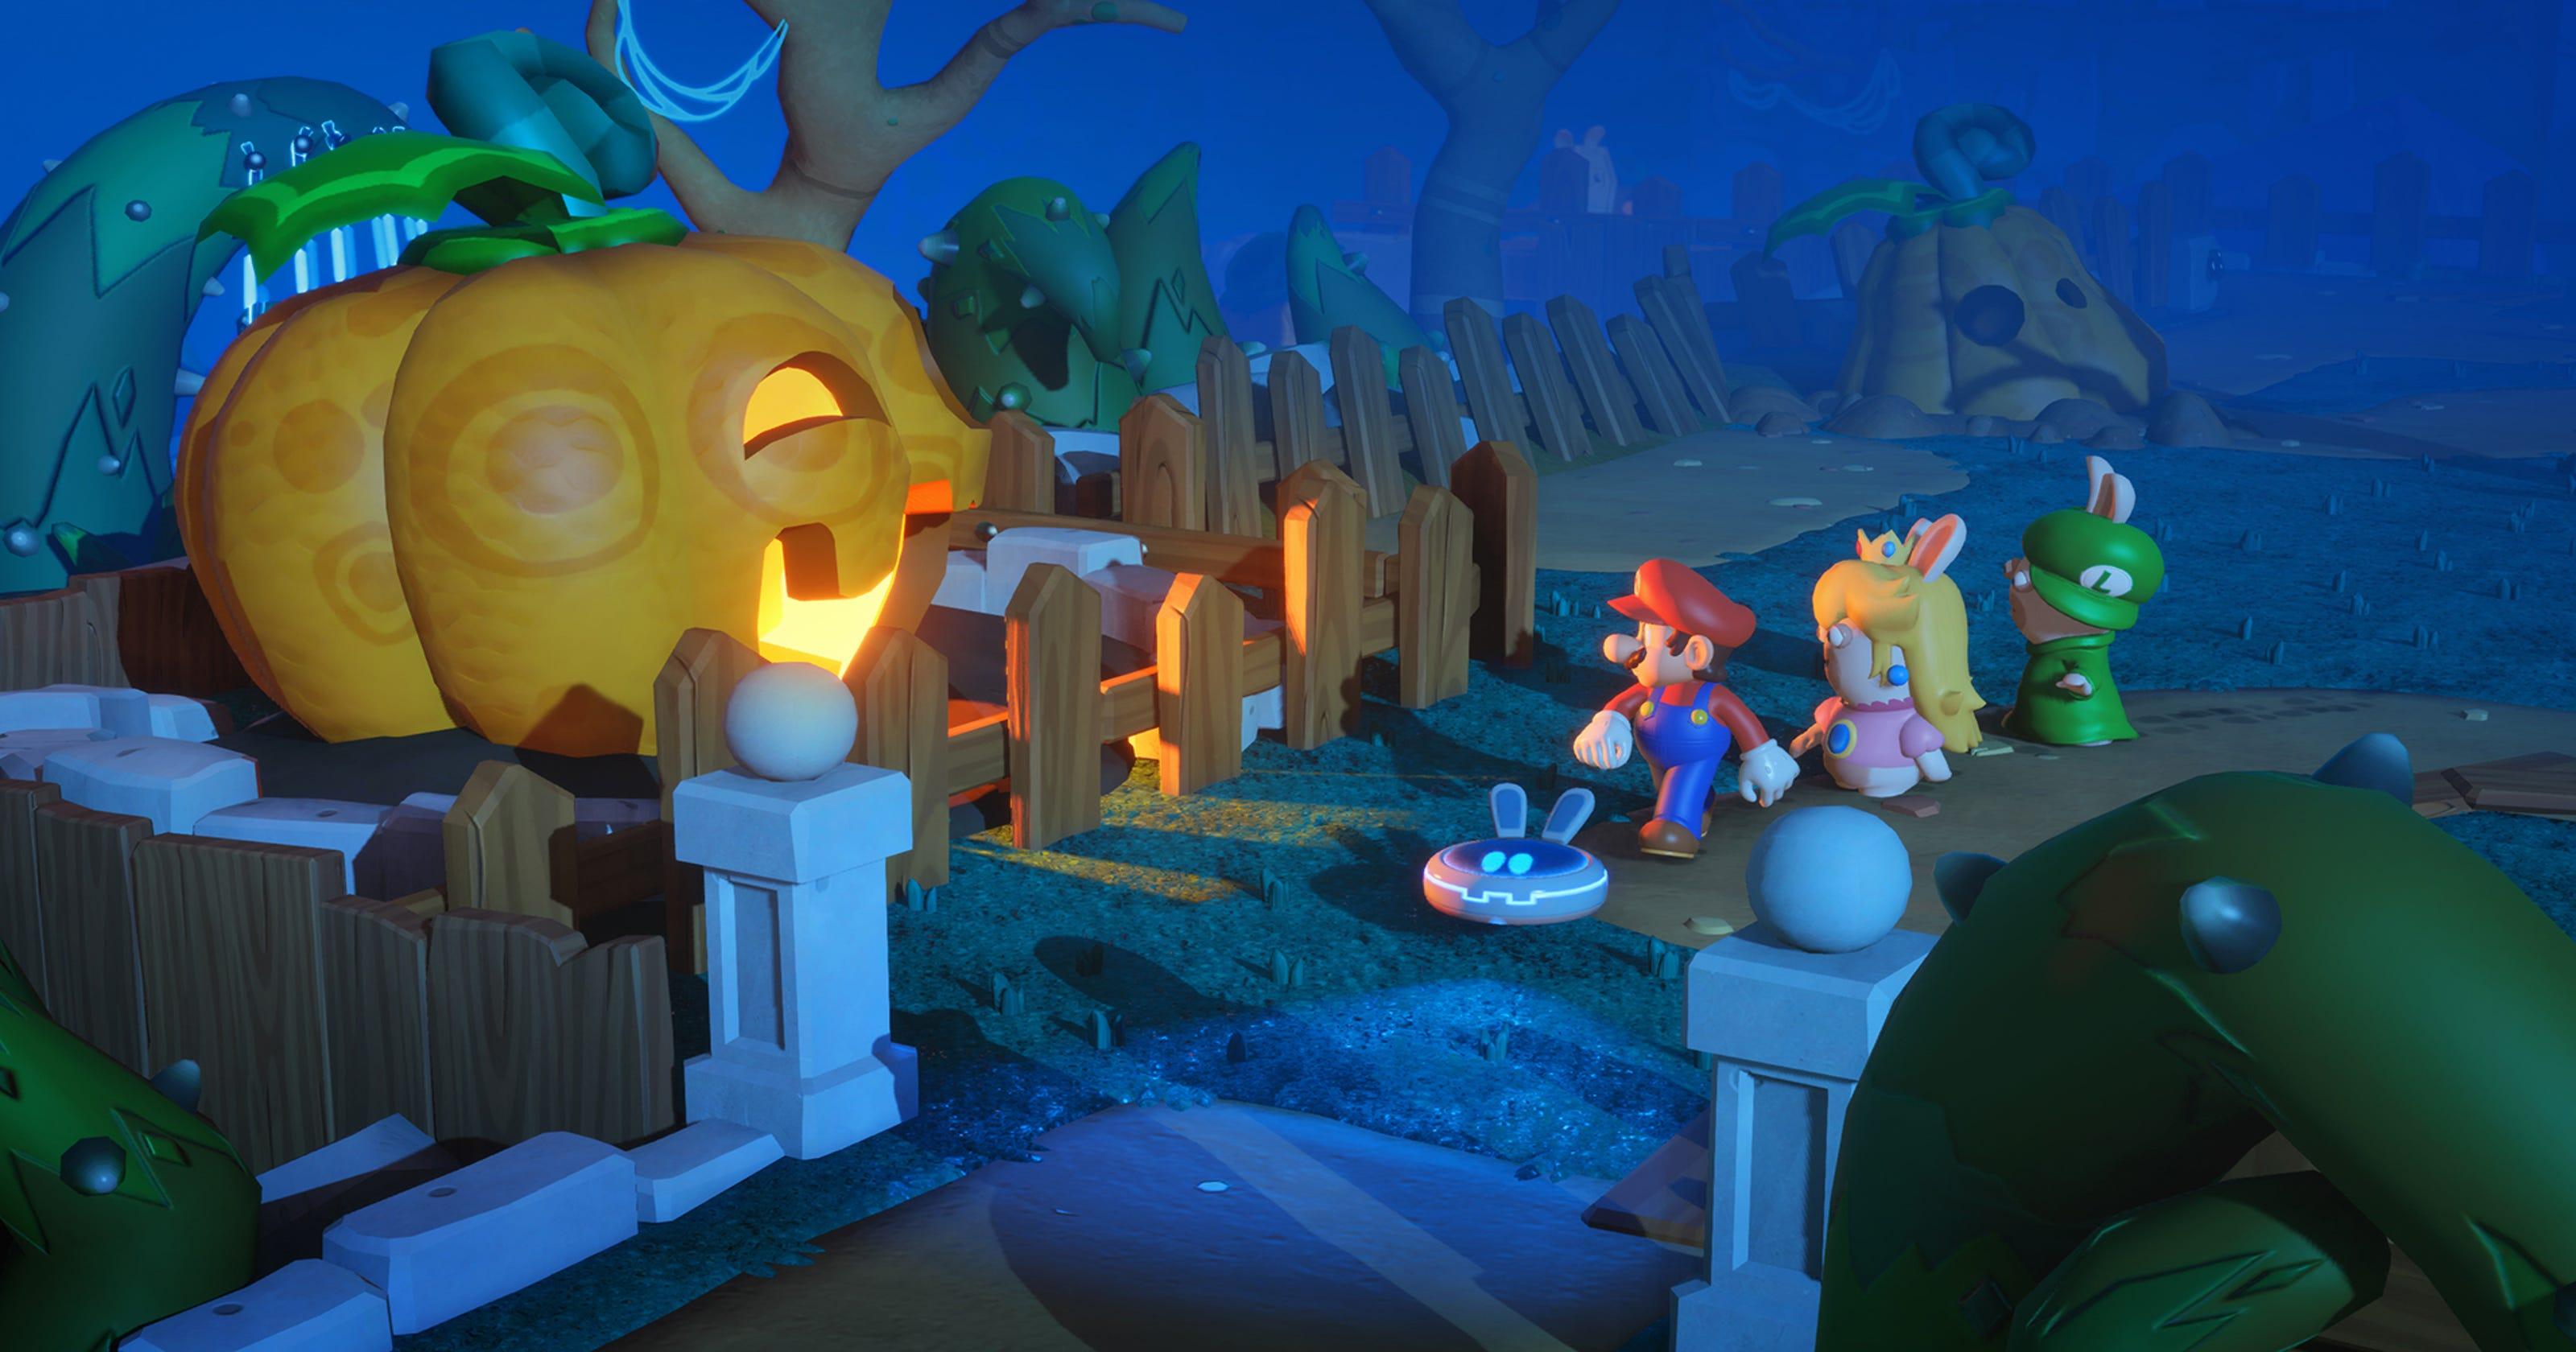 Mario + Rabbids Kingdom Battle Guide: Weapons, Abilities